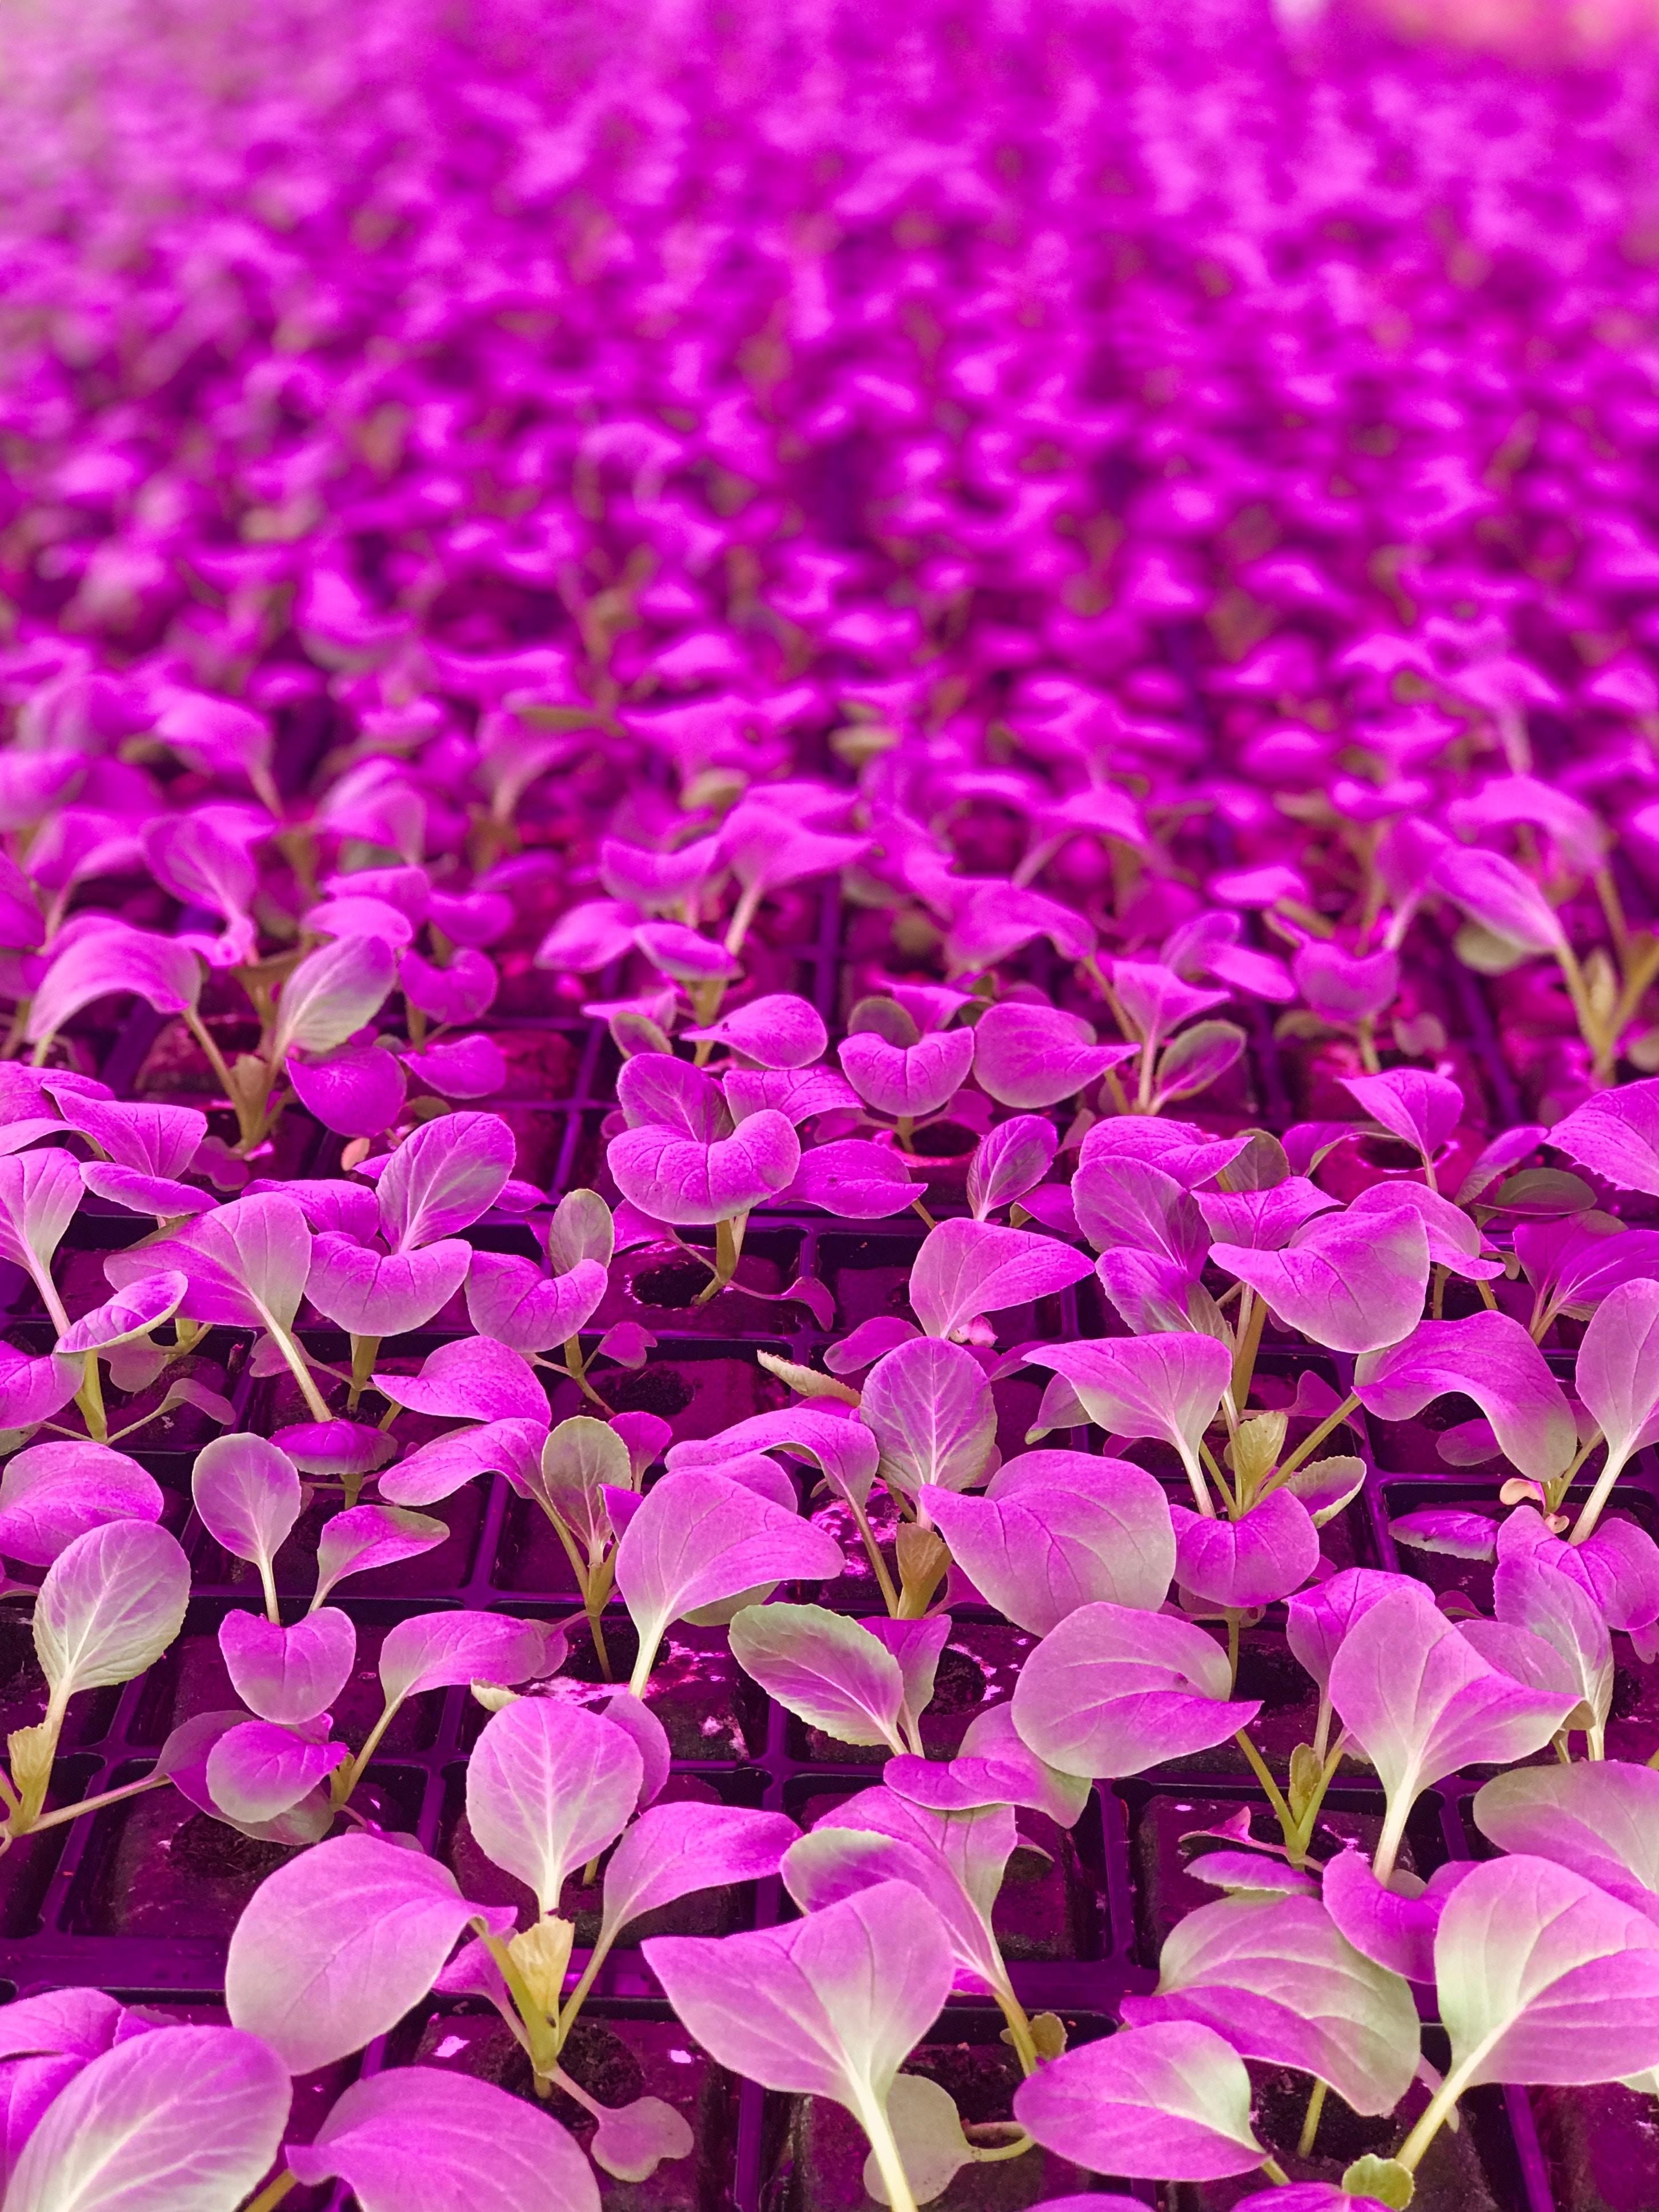 purple flowers in shallow focus shot